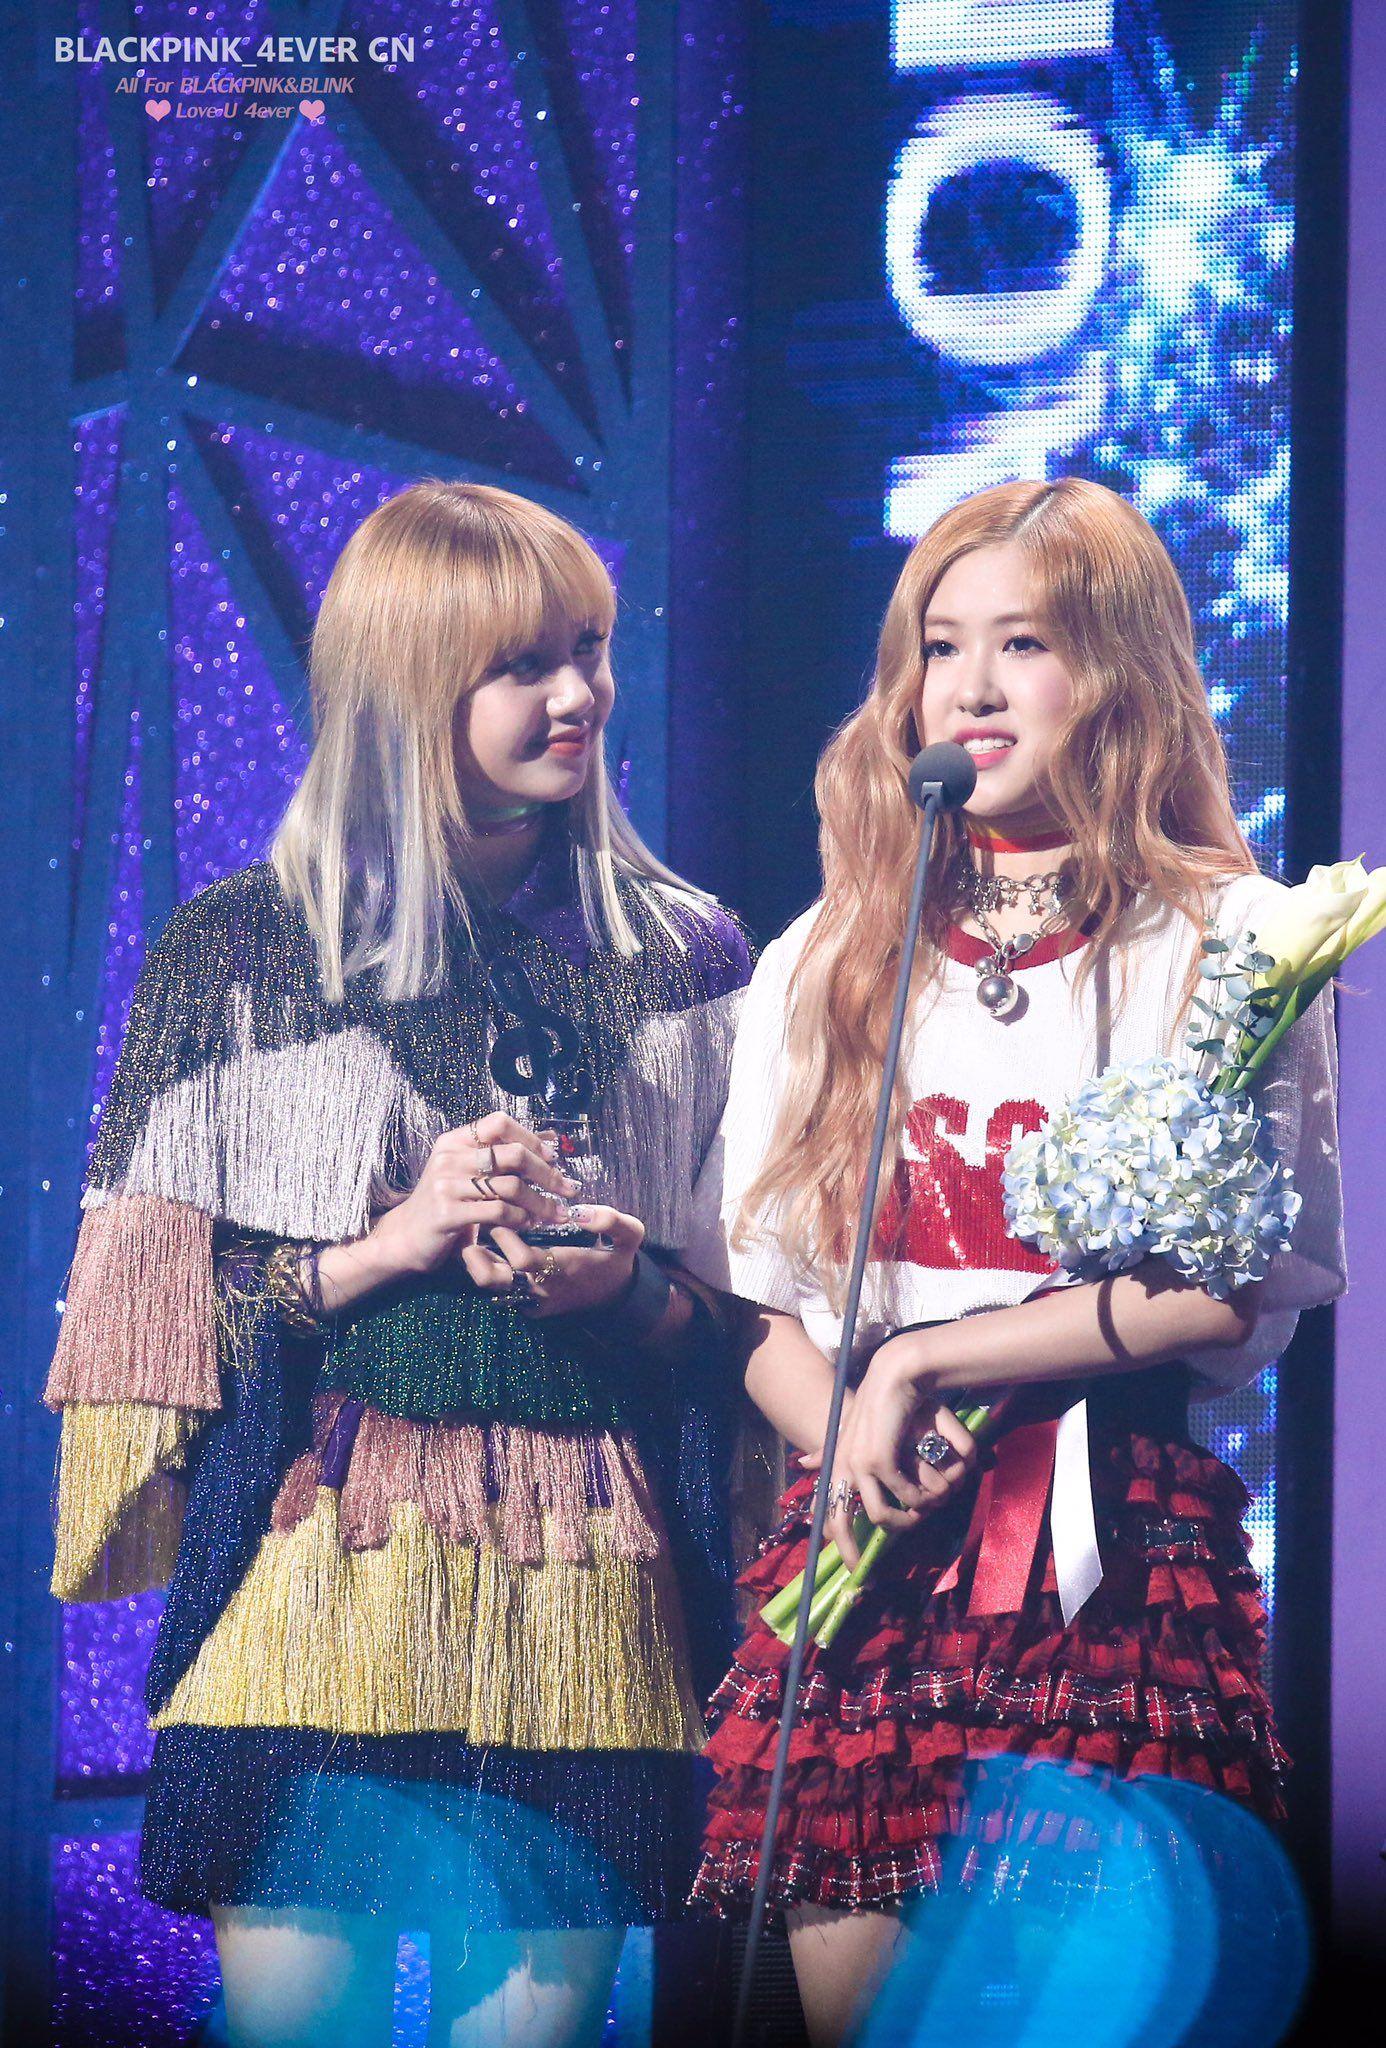 "BLACKPINK_4EVER CN on Twitter: ""170222【HQ】가온차트 Gaon Chart Music Awards  #BLACKPINK #블랙핑크 #ROSÉ #LISA  #로제 #리사 https://t.co/iV9q34N9Xq"""